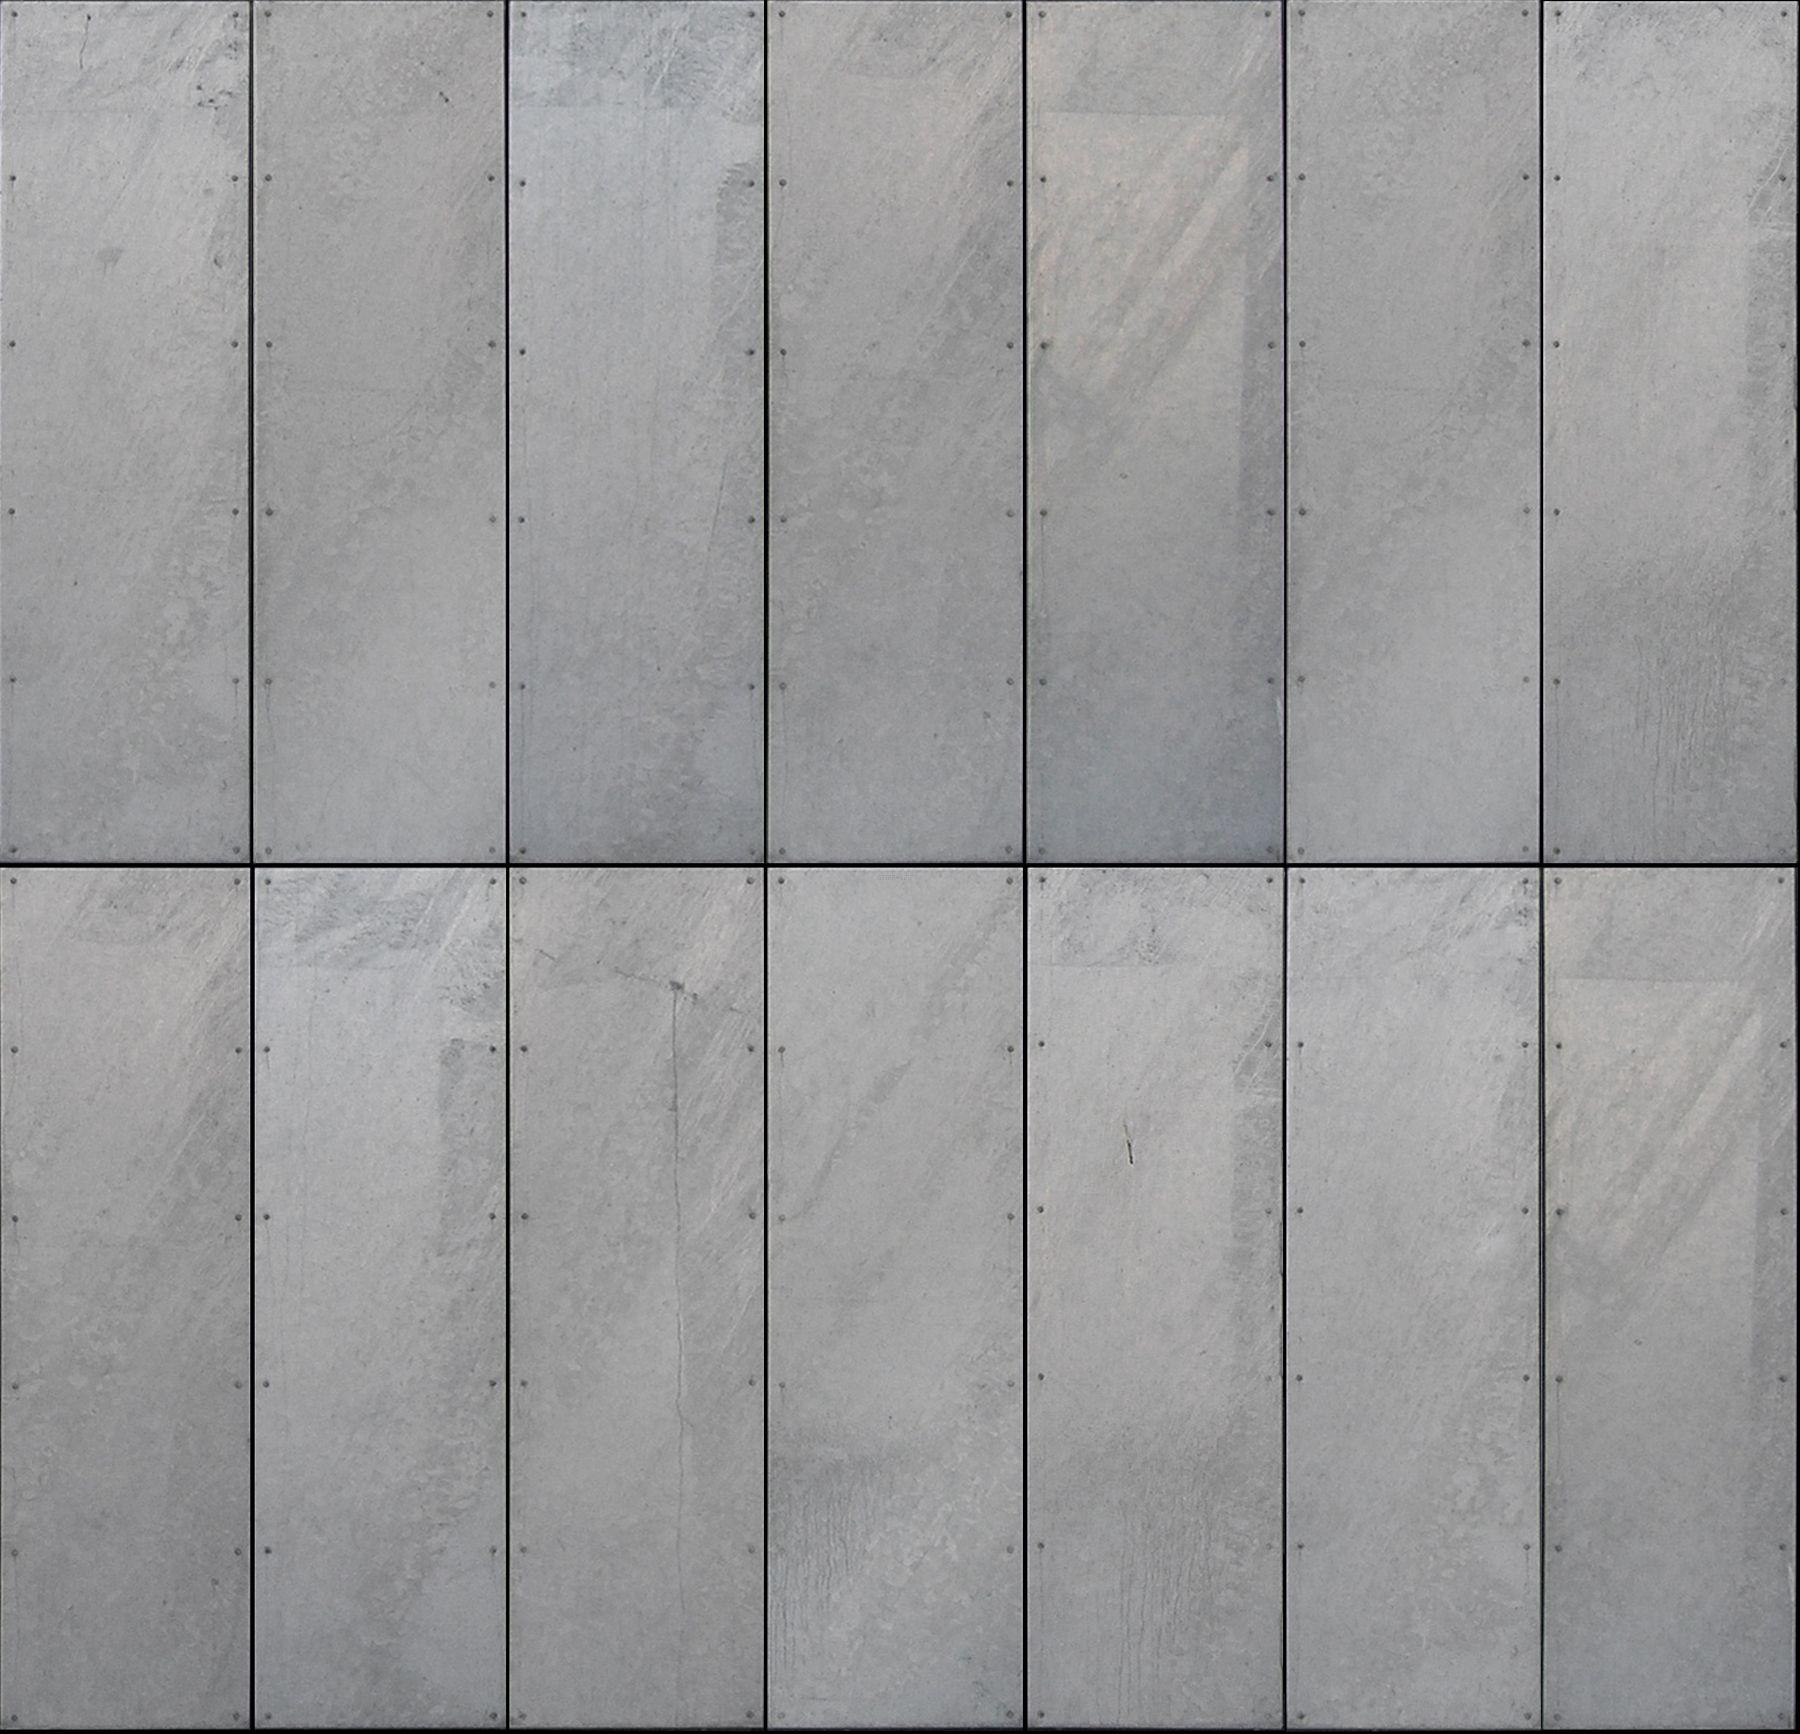 Galvanized Steel Panels Seamless Texture Materials Textures In